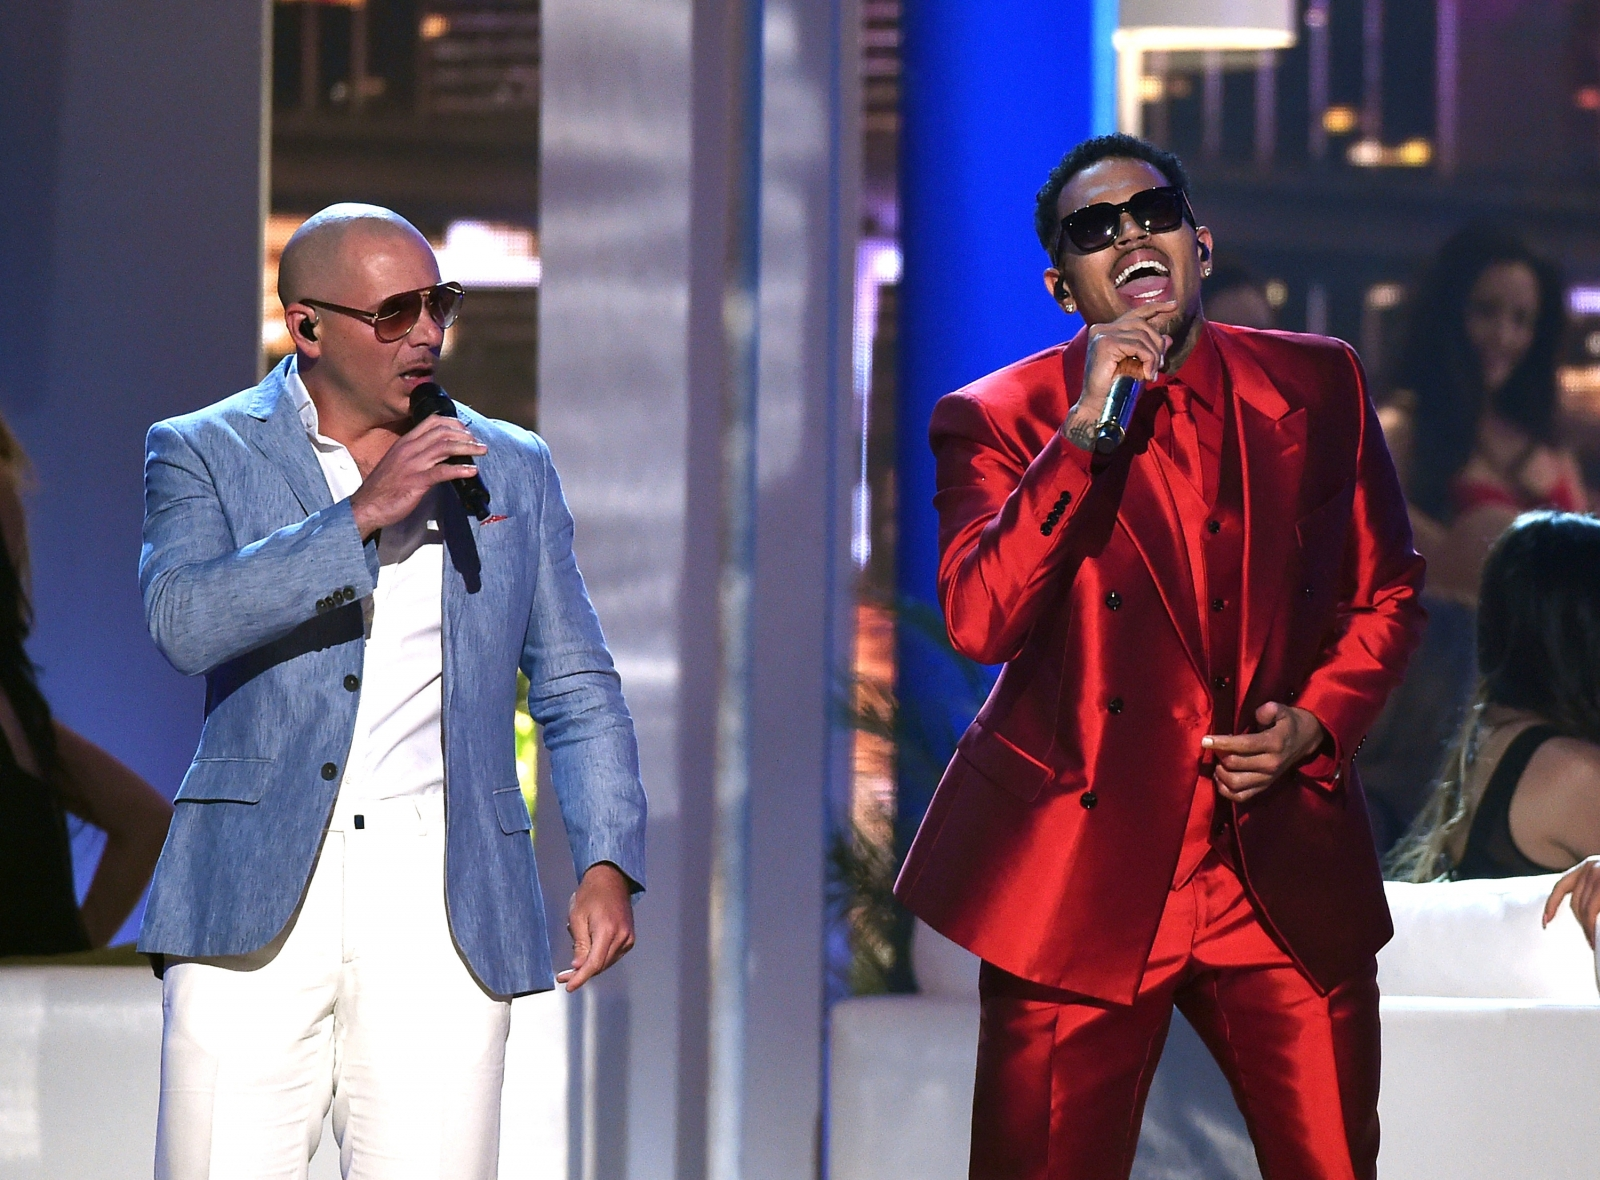 Chris Brown and Pitbull